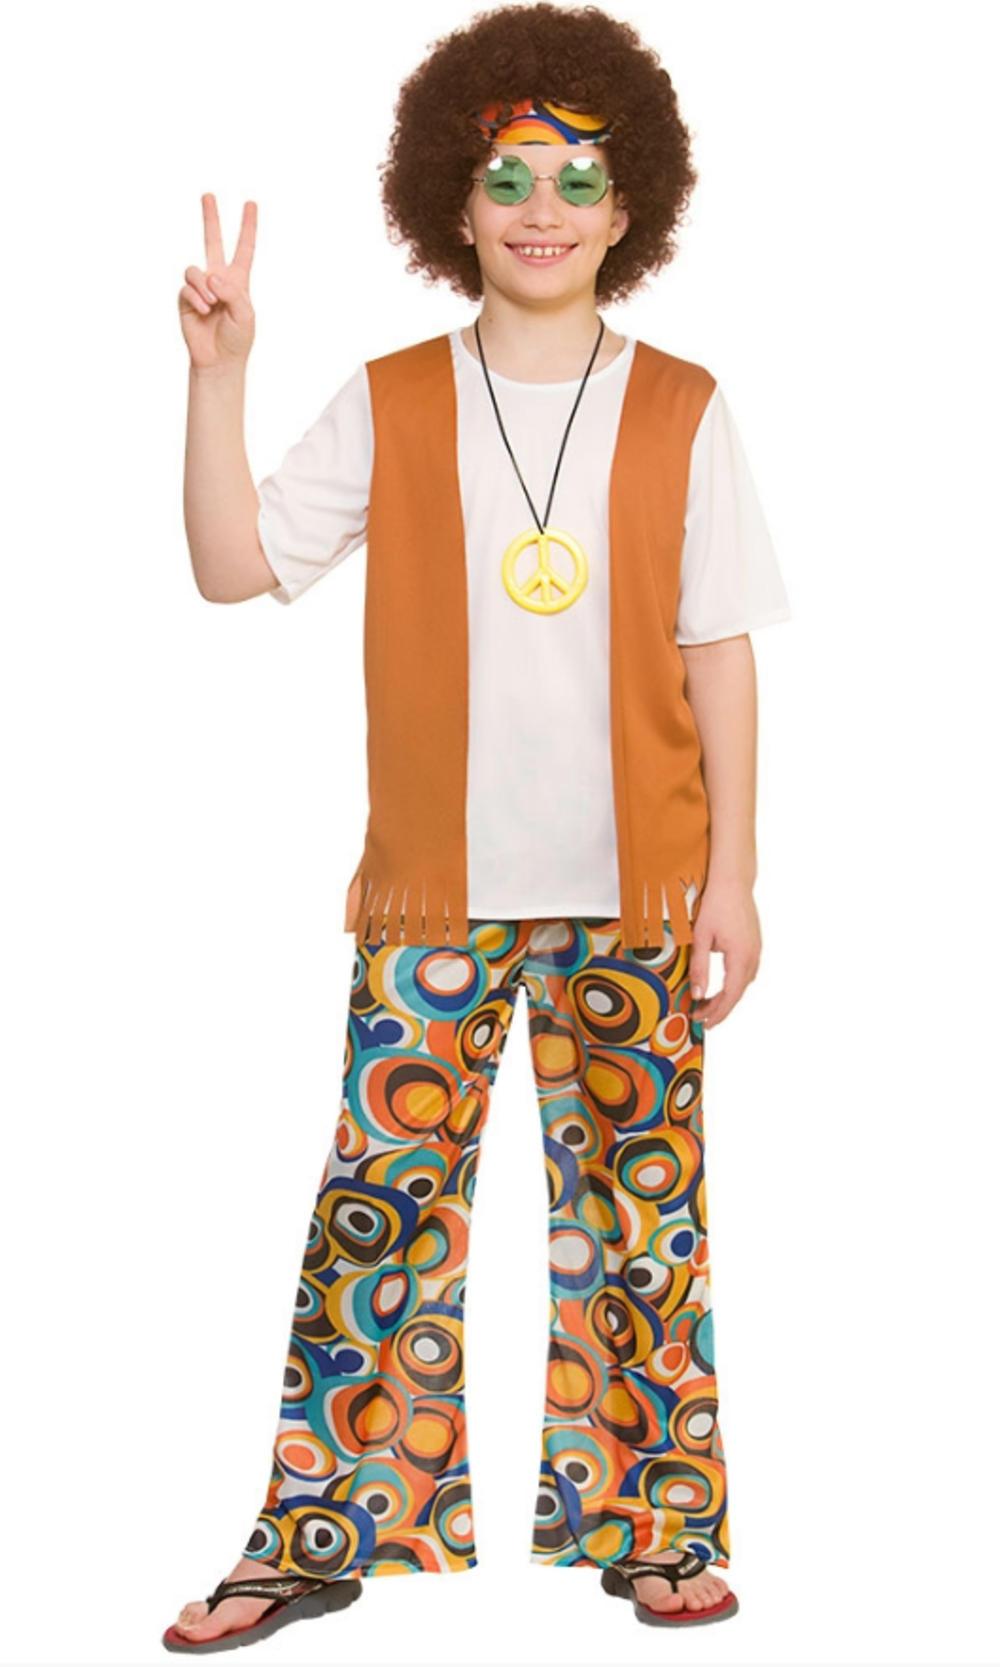 Cool Hippie Boys Fancy Dress Retro 60s 70s Groovy Hippy Kids Childrens Costume